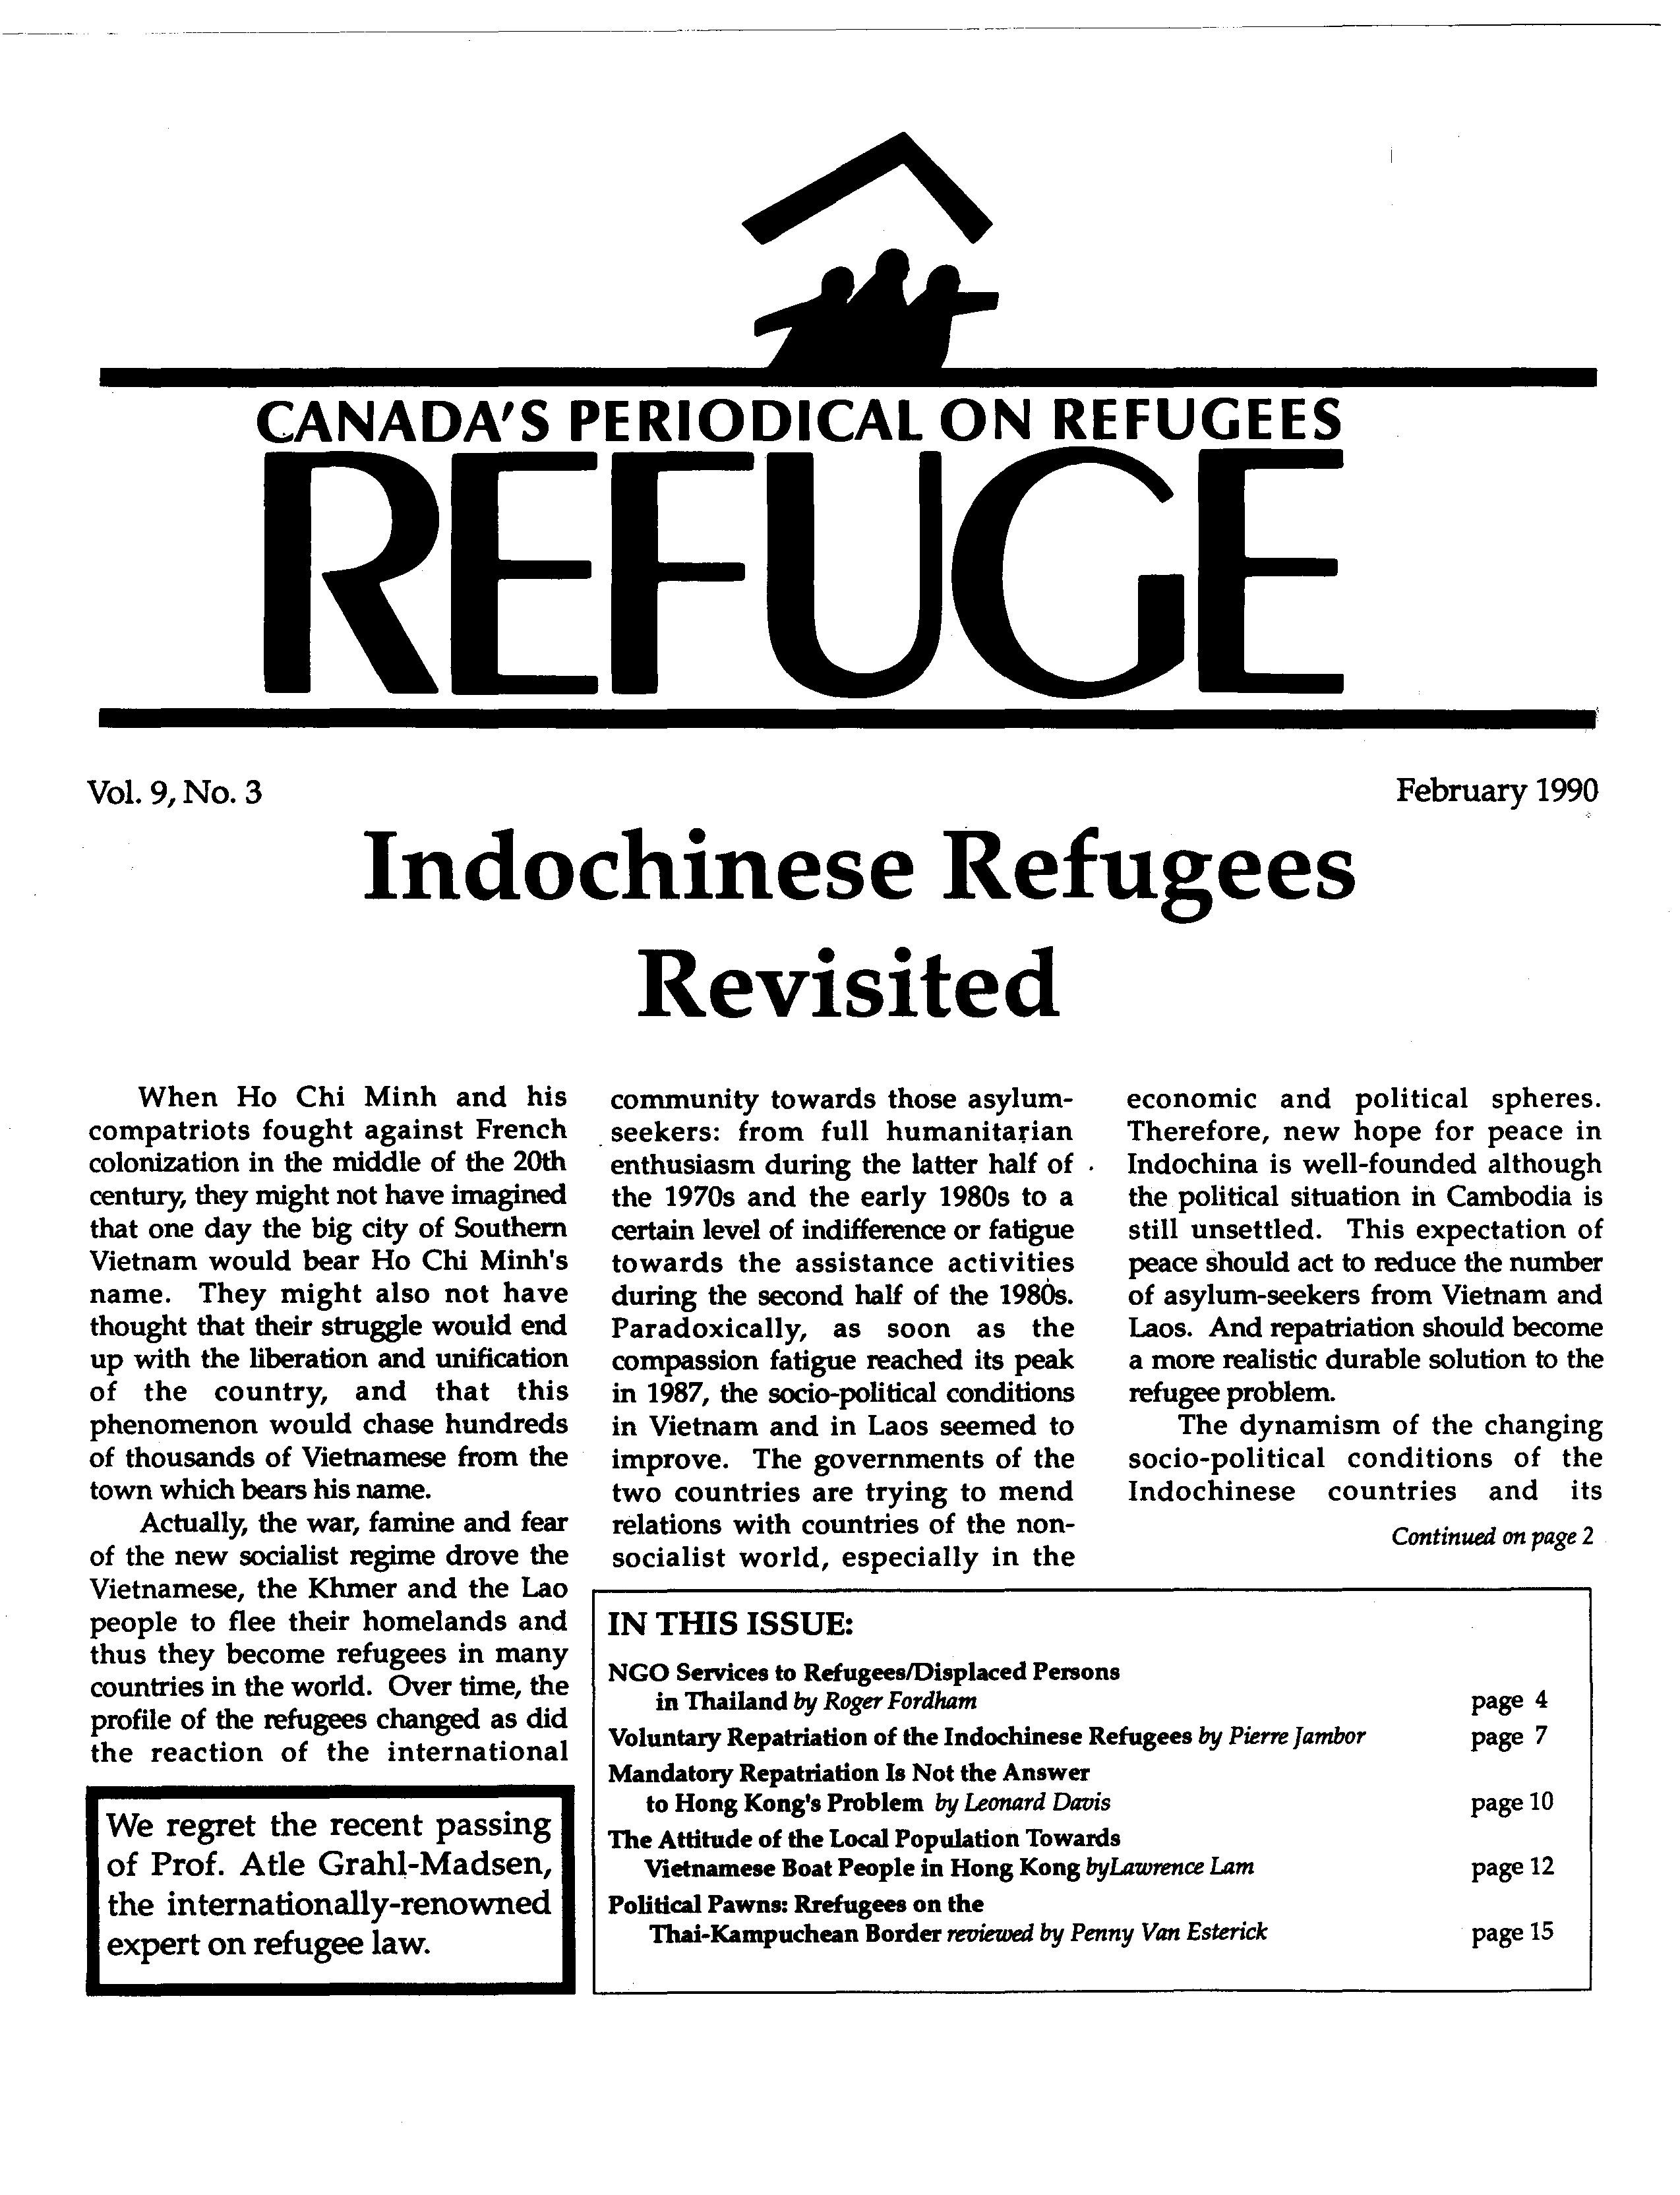 first page Refuge vol. 9.3 1990